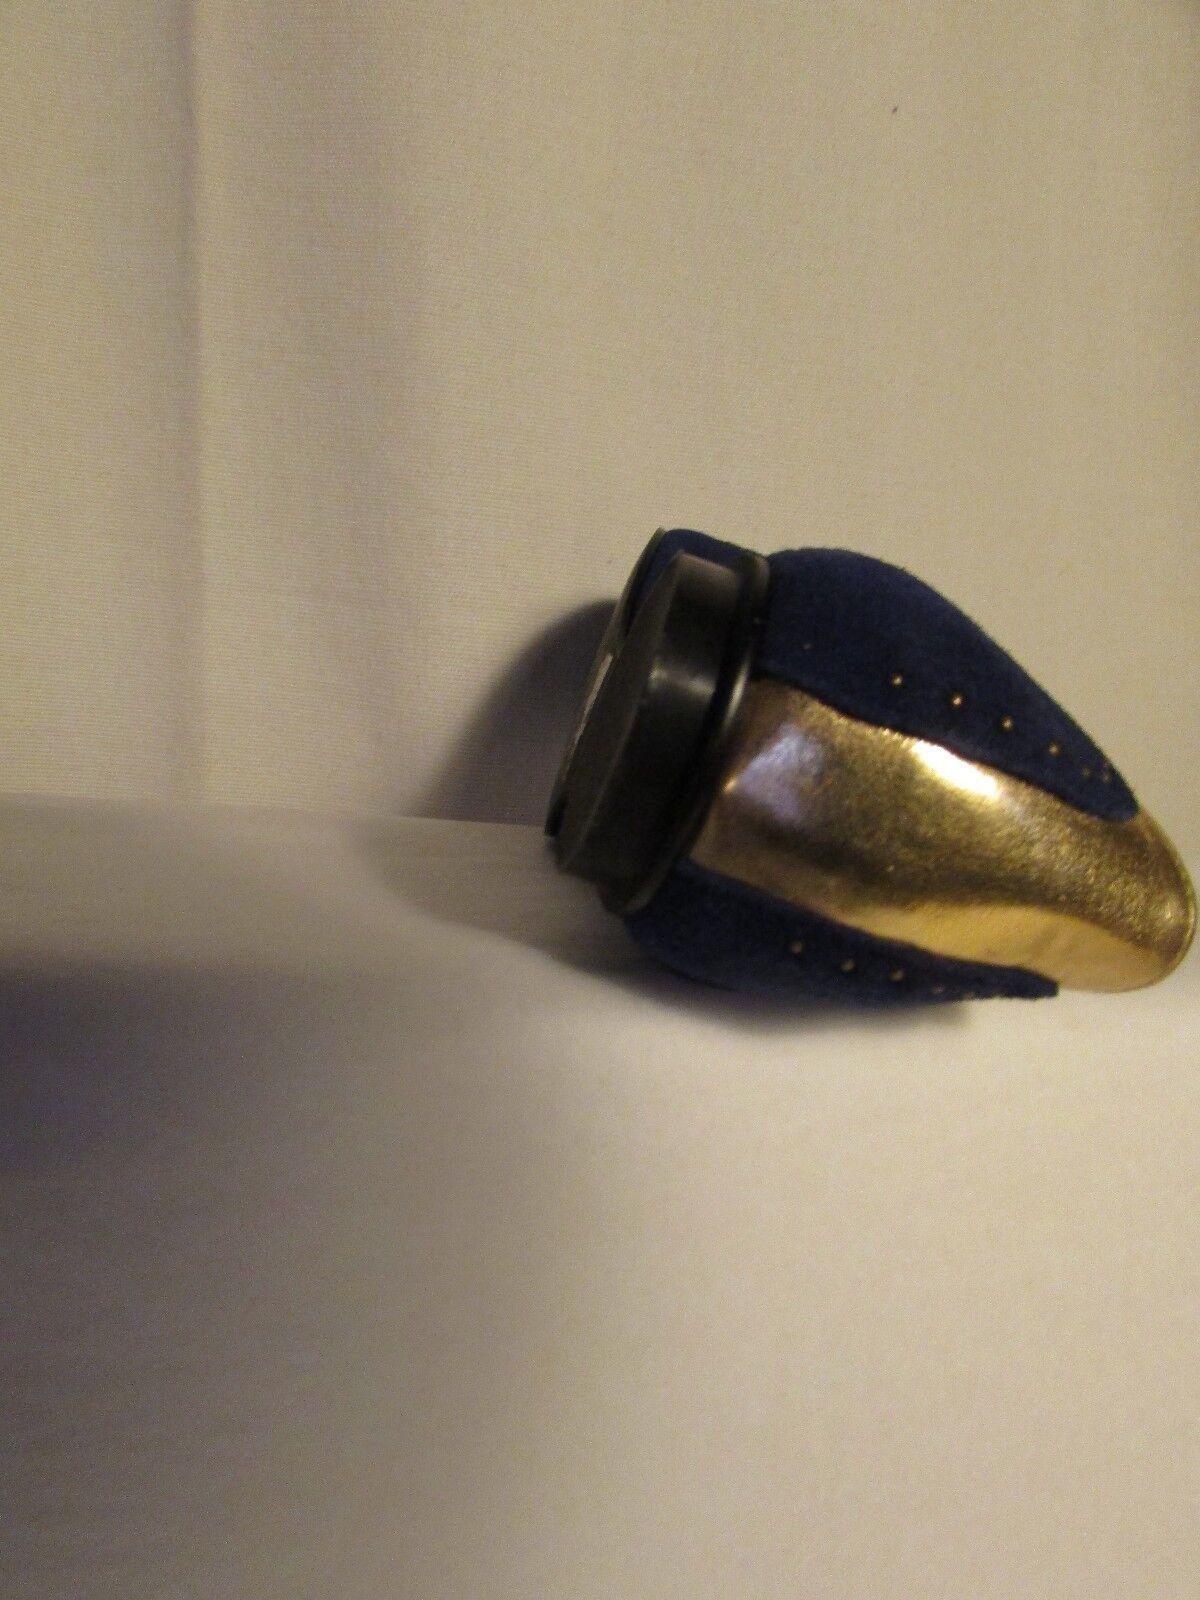 Ballerines SHELLYS LONDON daim bleu et cuir doré 39